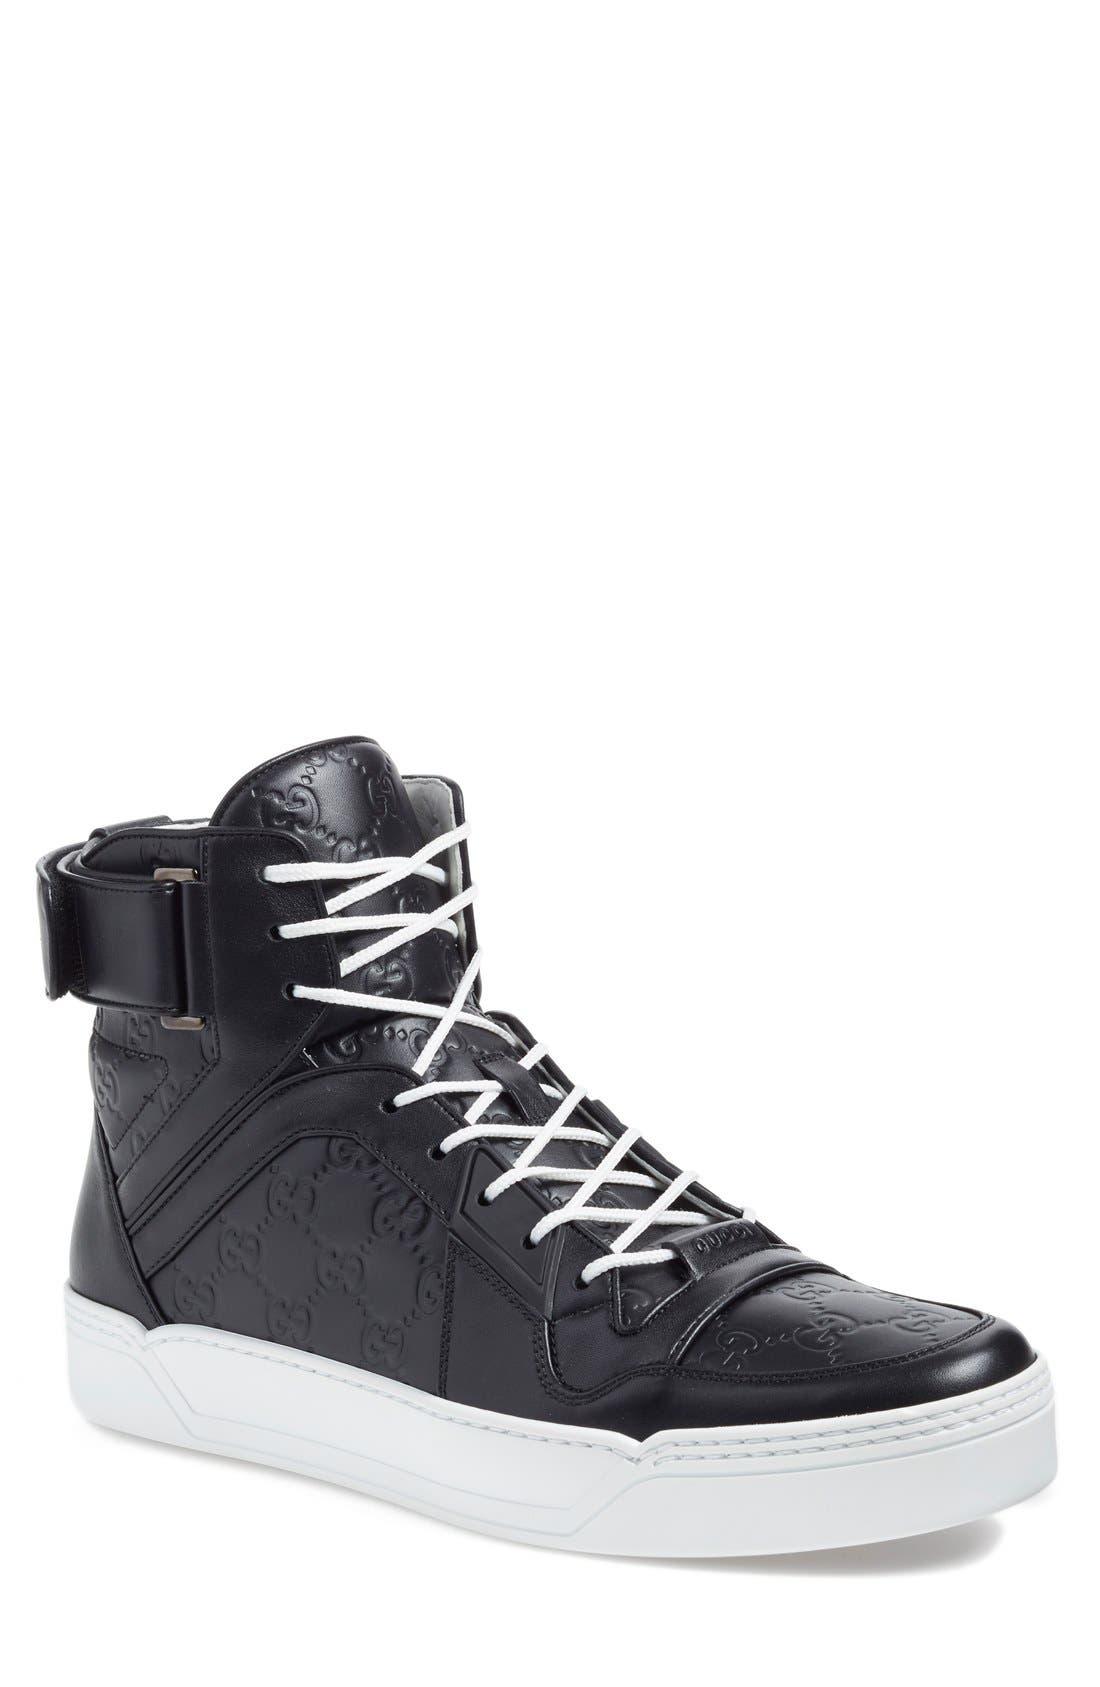 GUCCI 'New Basketball' High Top Sneaker